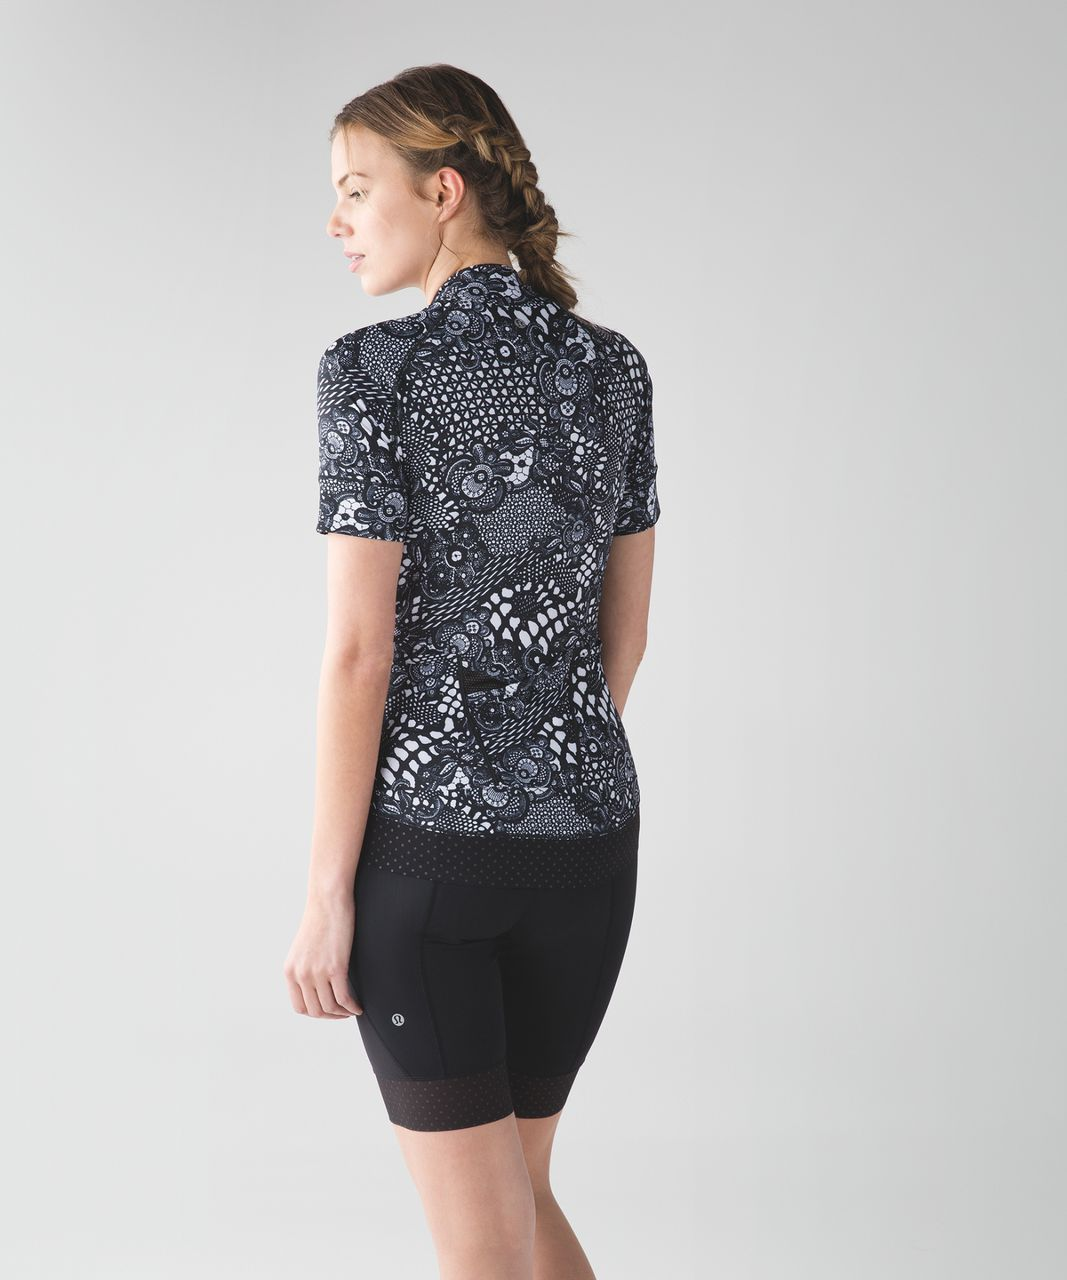 8e6cd8a0b Lululemon Shift Happens Jersey - Maxi Pretty Lace White Black   Black